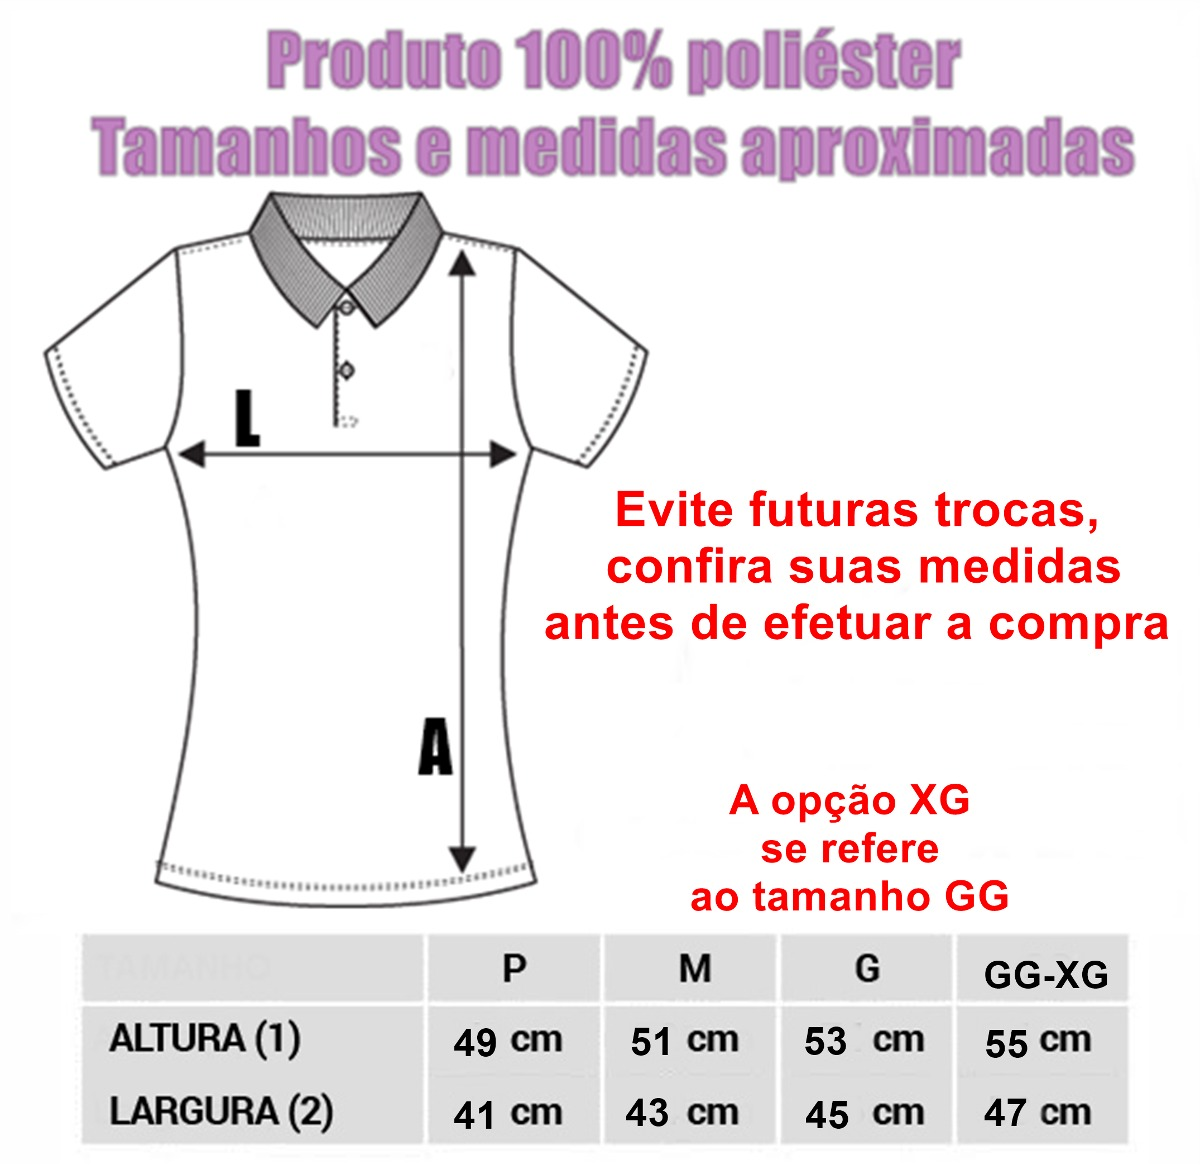 764112617b Camisa Polo Do São Paulo Baby Look Feminina Oficial - R  49